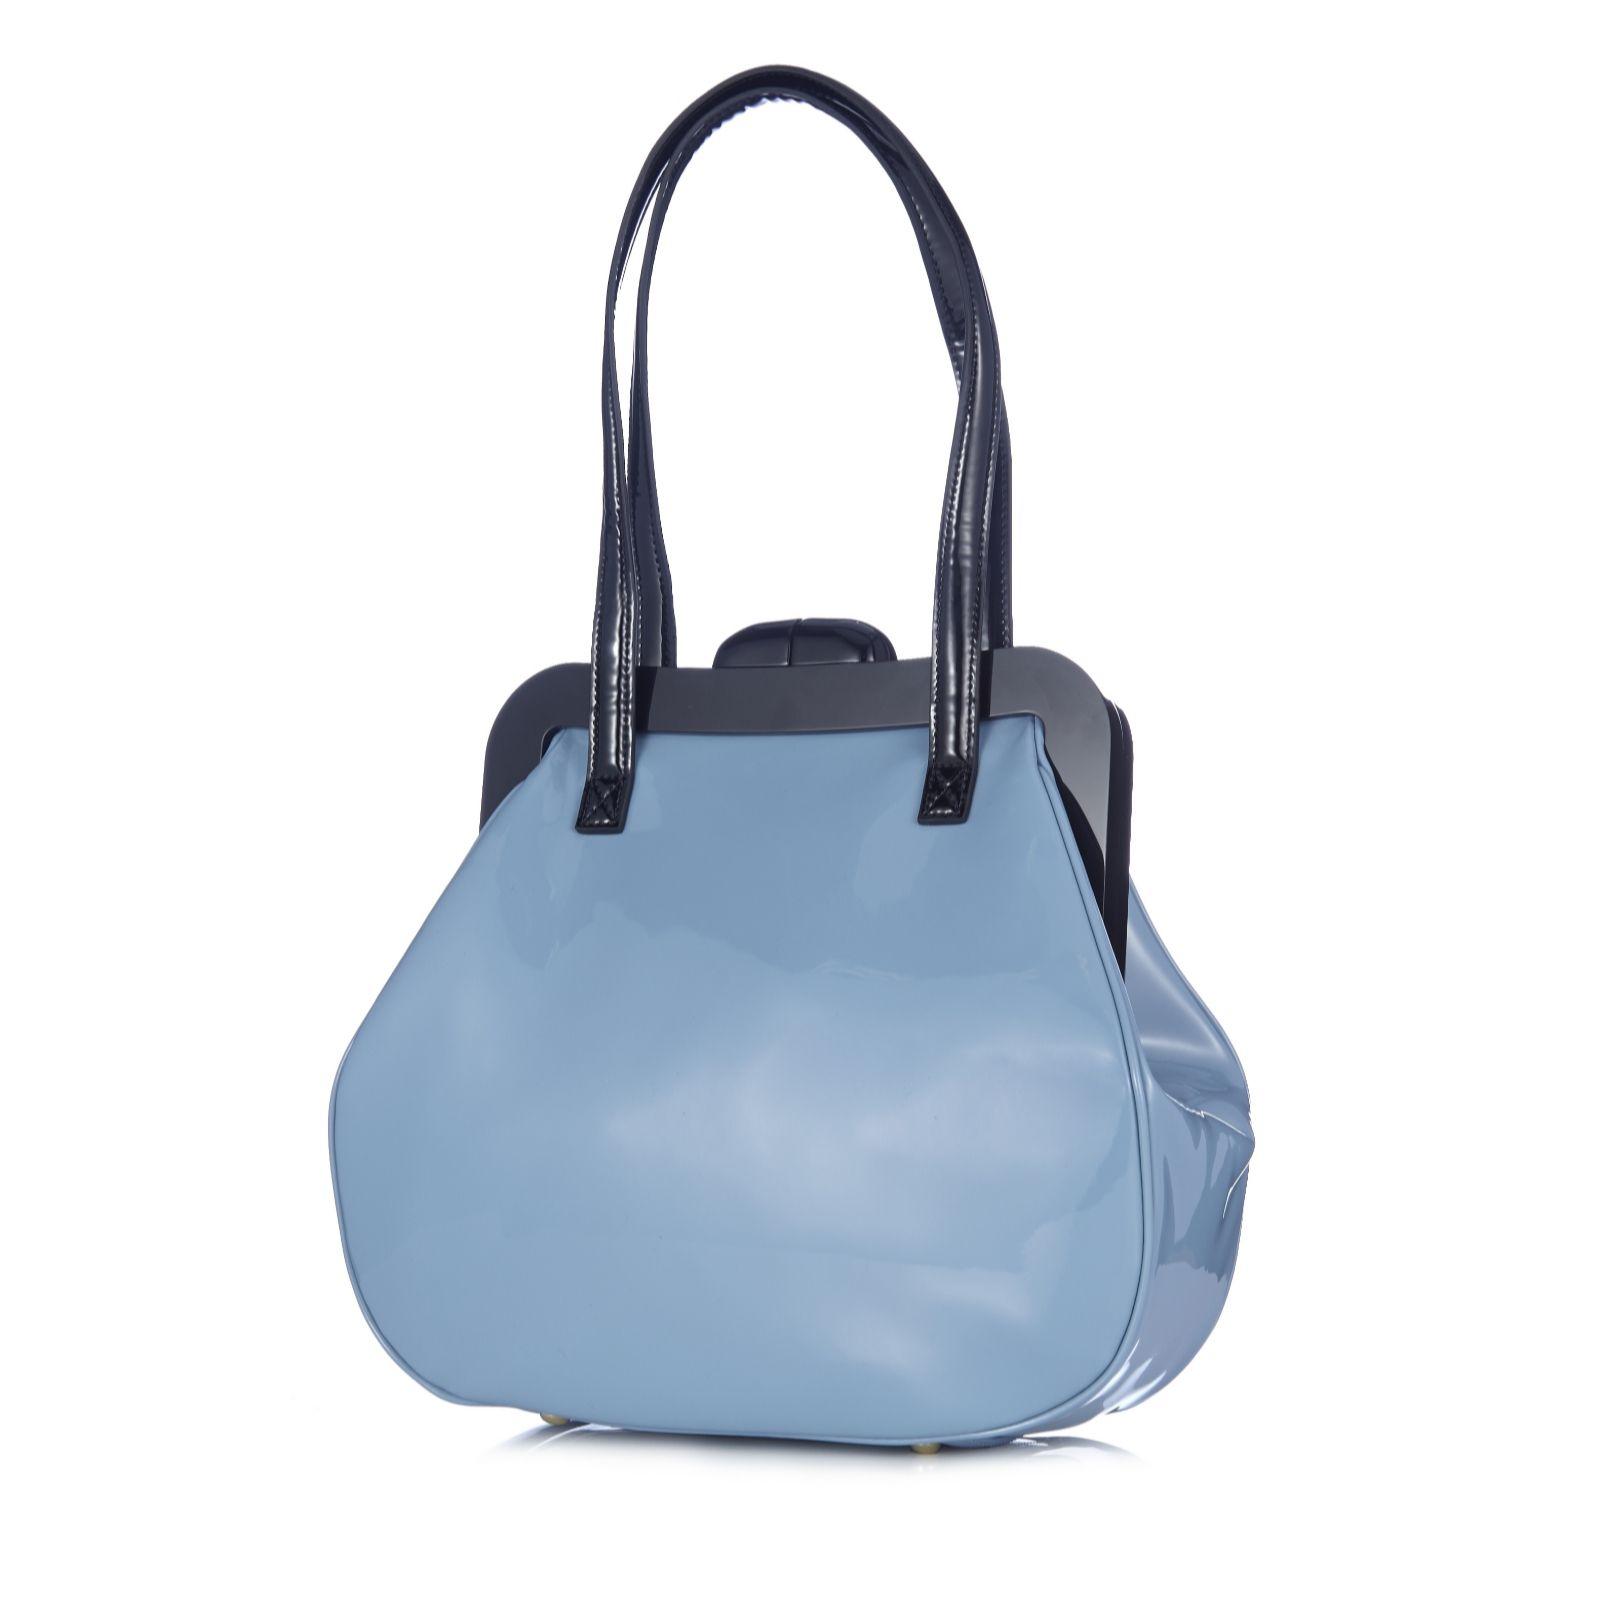 f6e4169f16 Lulu Guinness Mid Pollyanna Patent Leather Bag